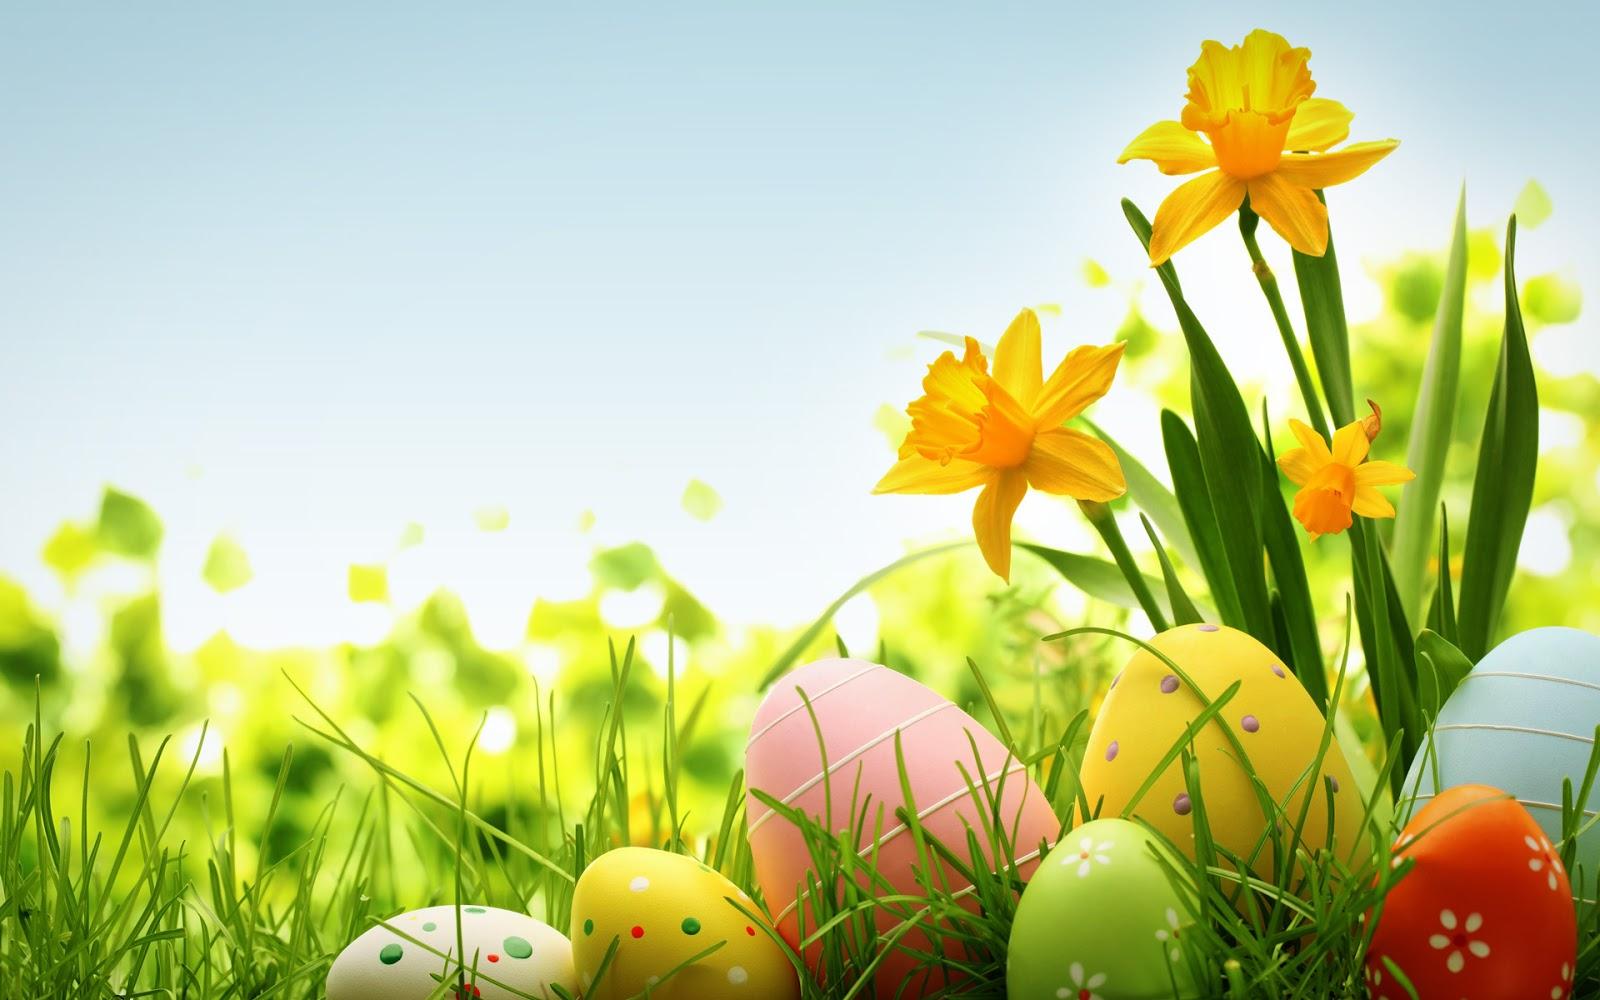 Easter egg wallpapers 2021